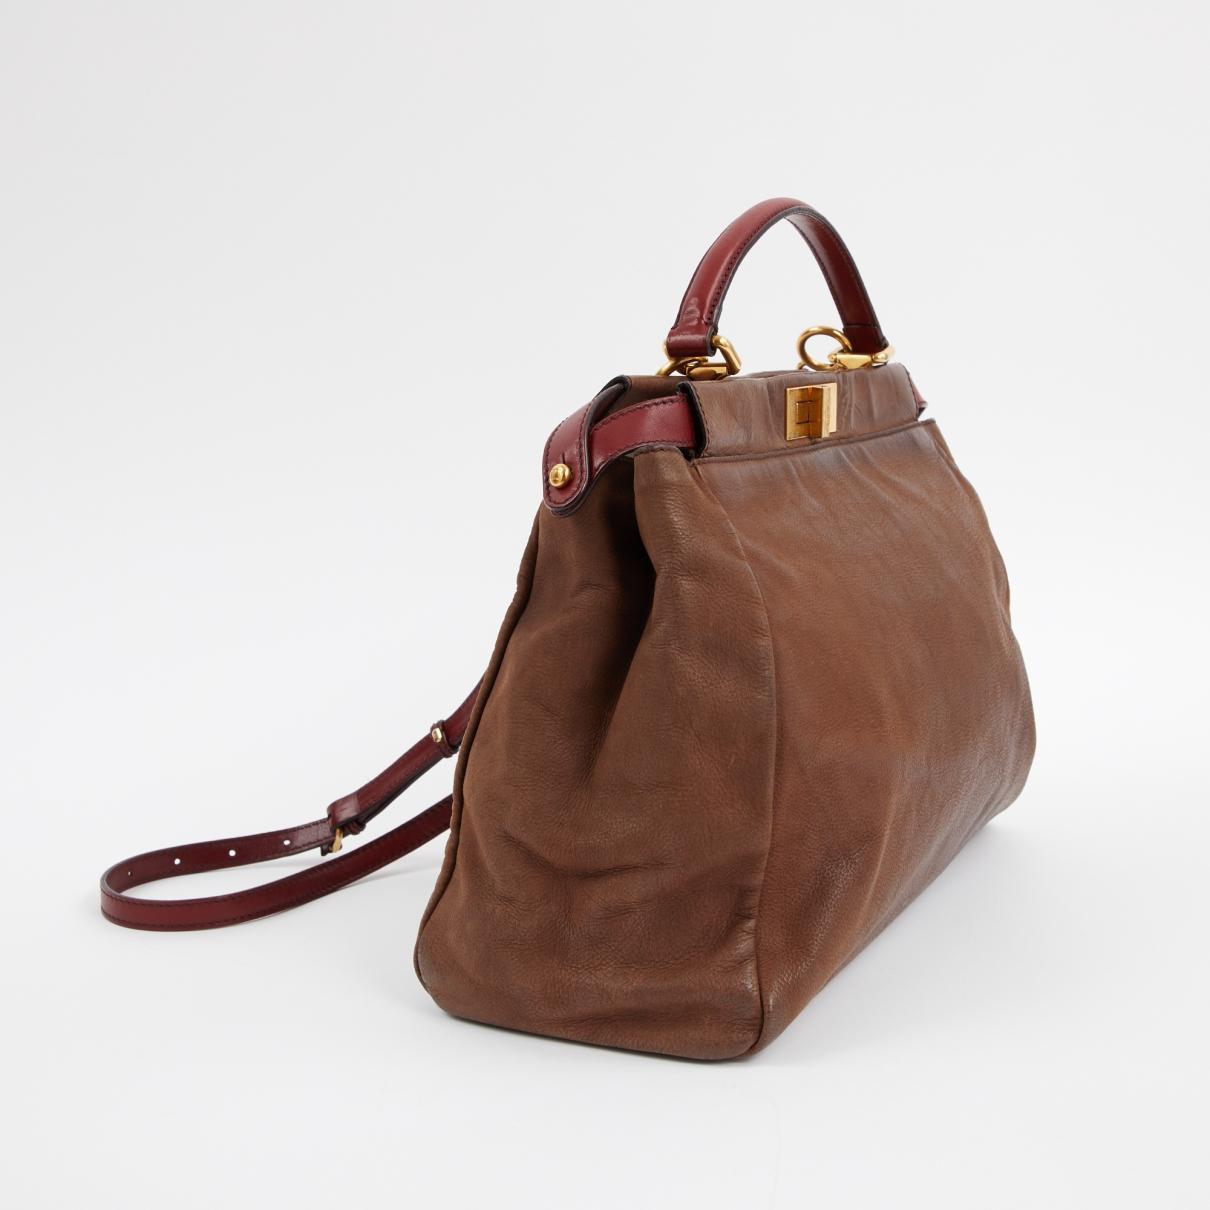 ec8509beff7a Fendi - Pre-owned Peekaboo Brown Leather Handbags - Lyst. View fullscreen